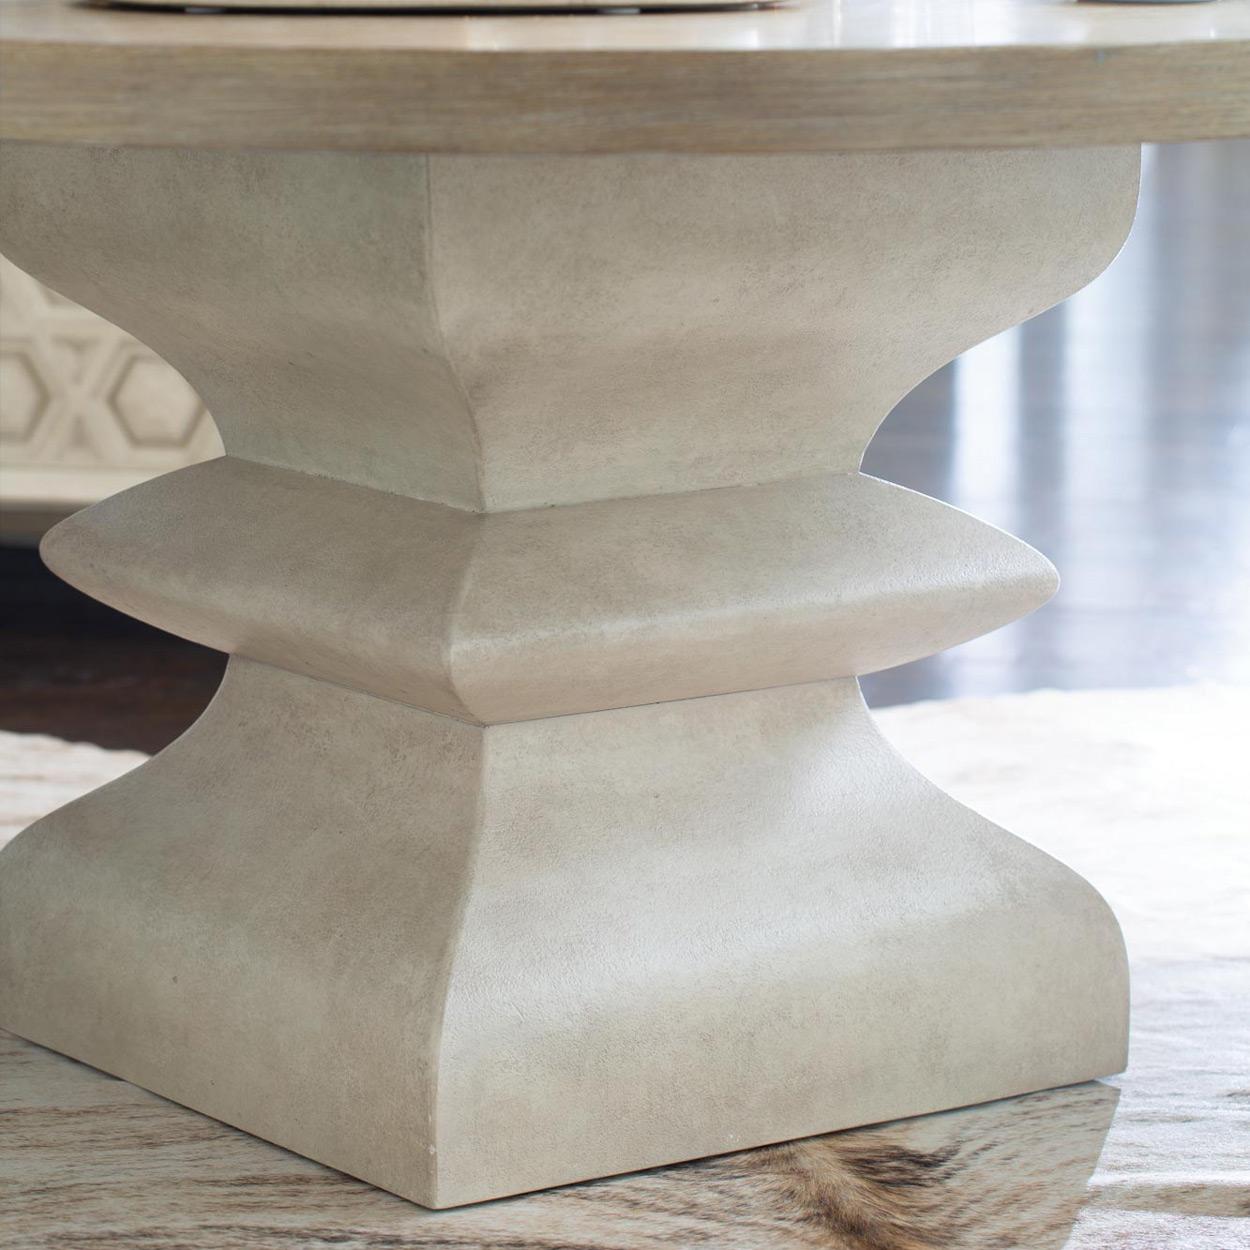 Sarabeth Modern French Brown Wood White Hexagon Pedestal Base Round Dining Table - 60D